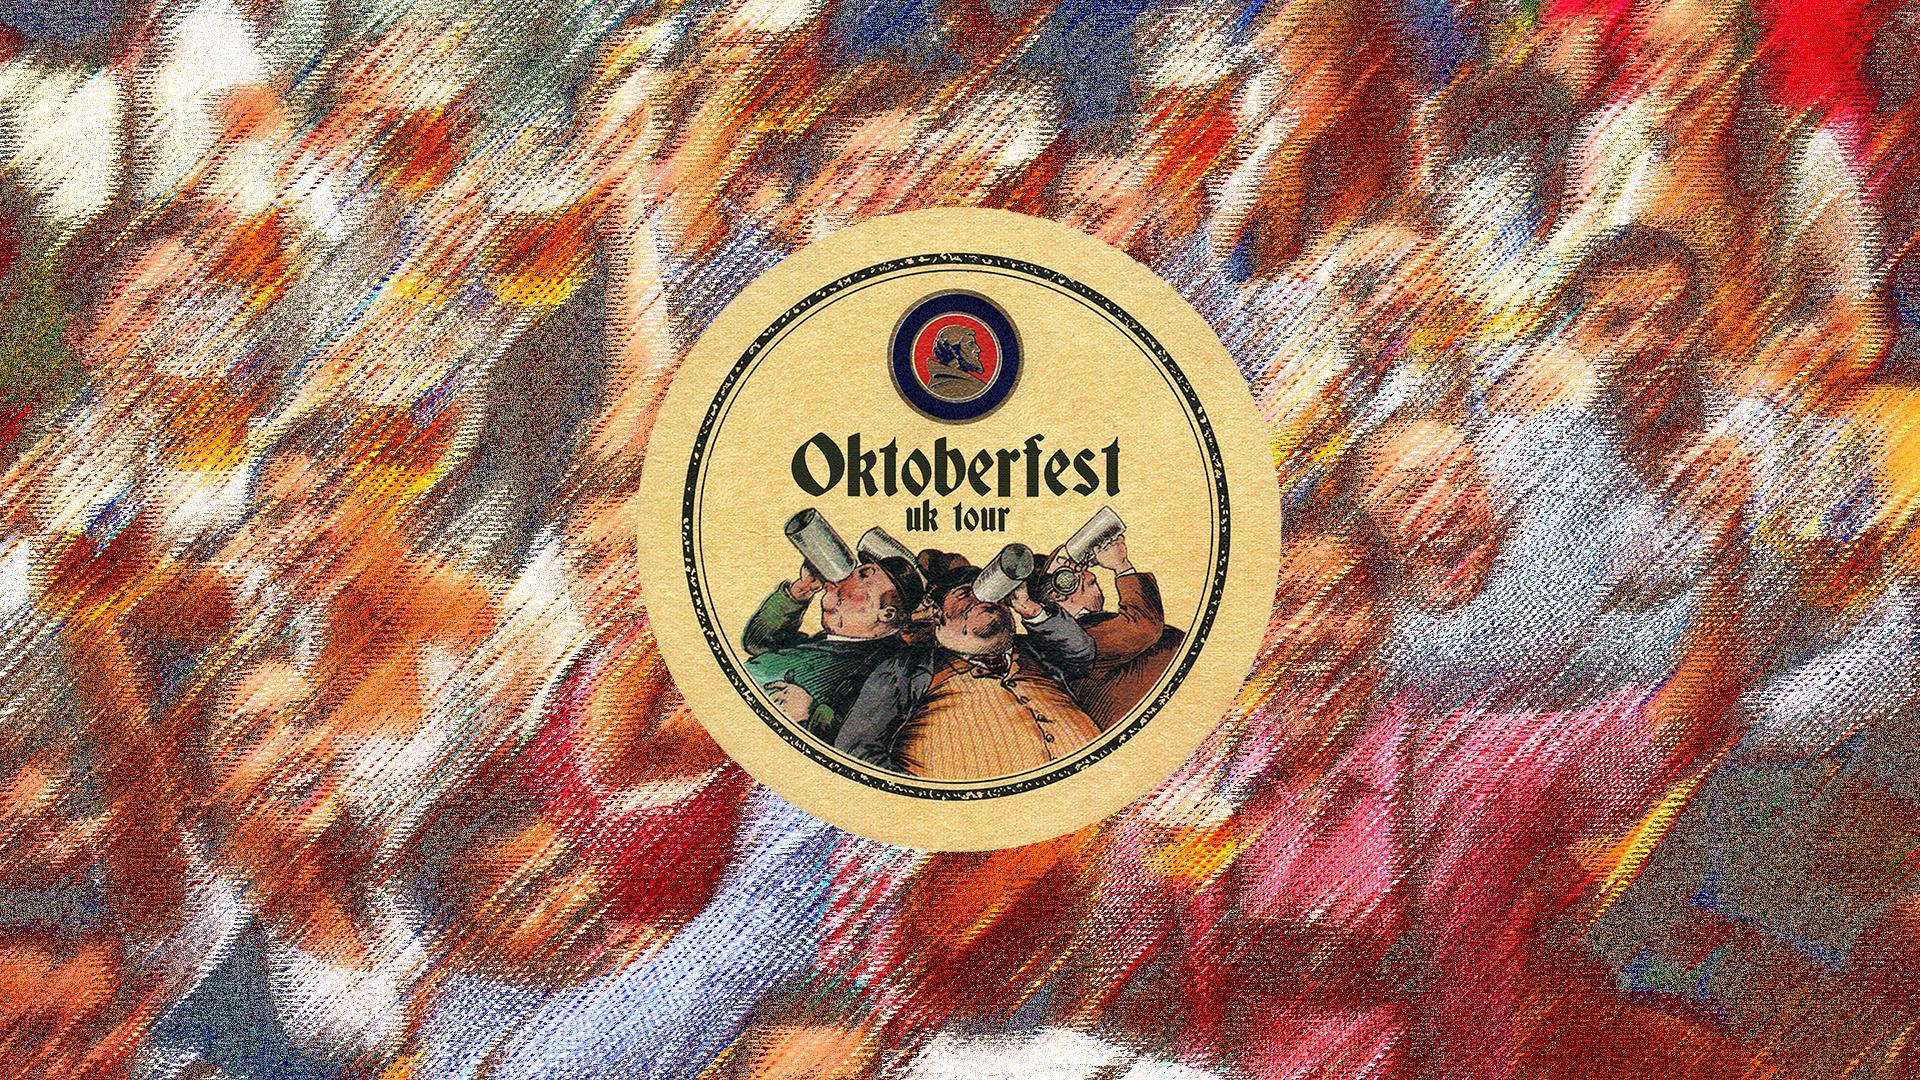 Oktoberfest Sunderland 2020